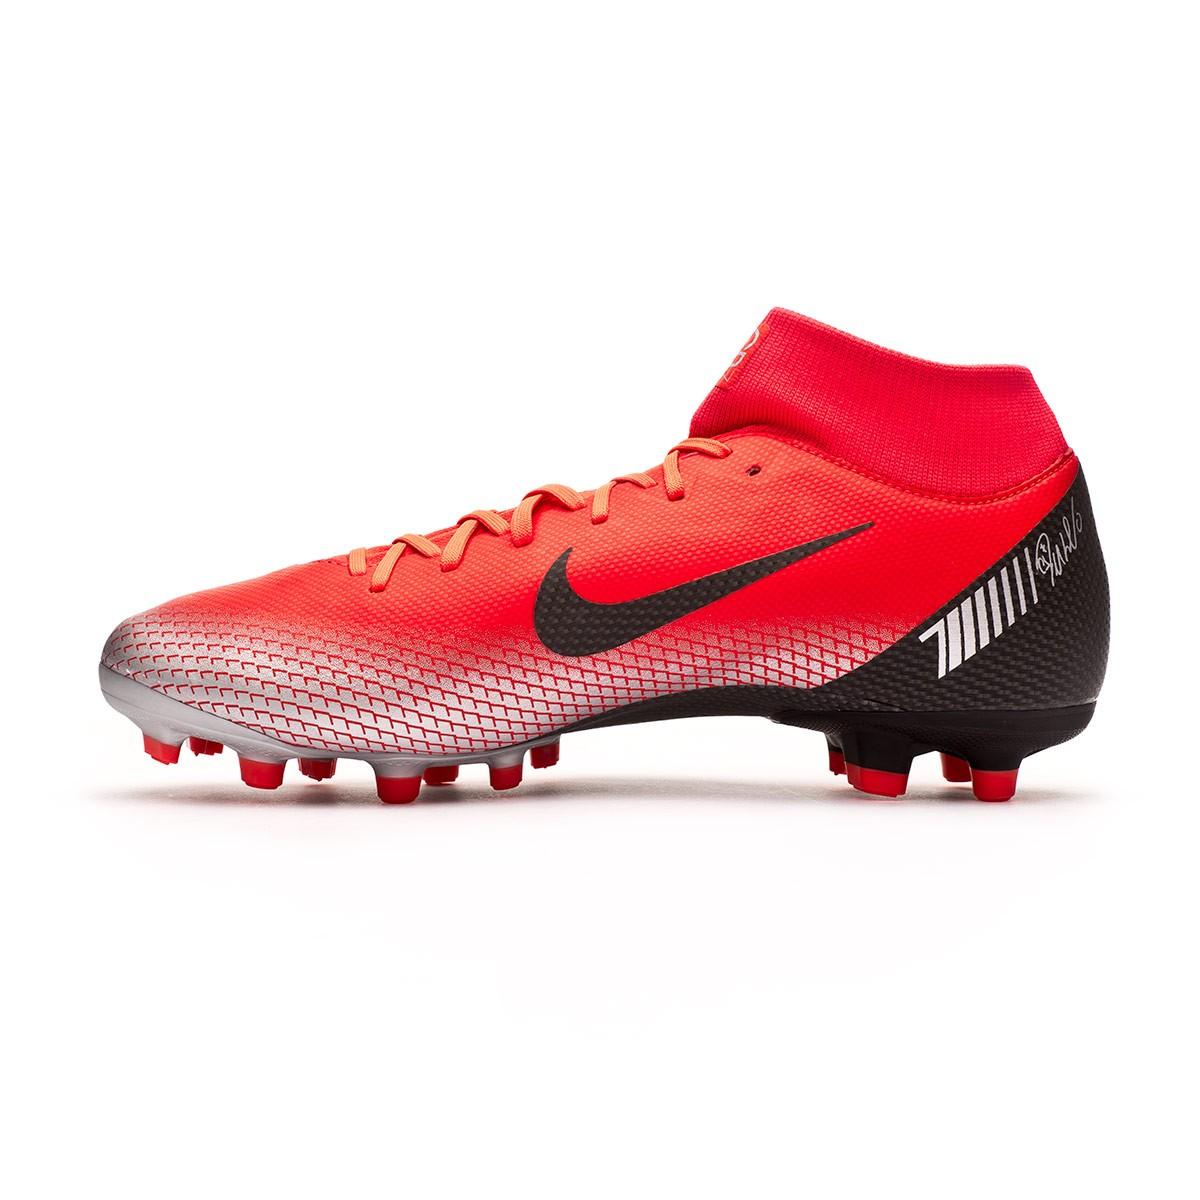 ea7a3659a867 Football Boots Nike Mercurial Superfly VI Academy CR7 MG Bright  crimson-Black-Chrome-Dark grey - Football store Fútbol Emotion